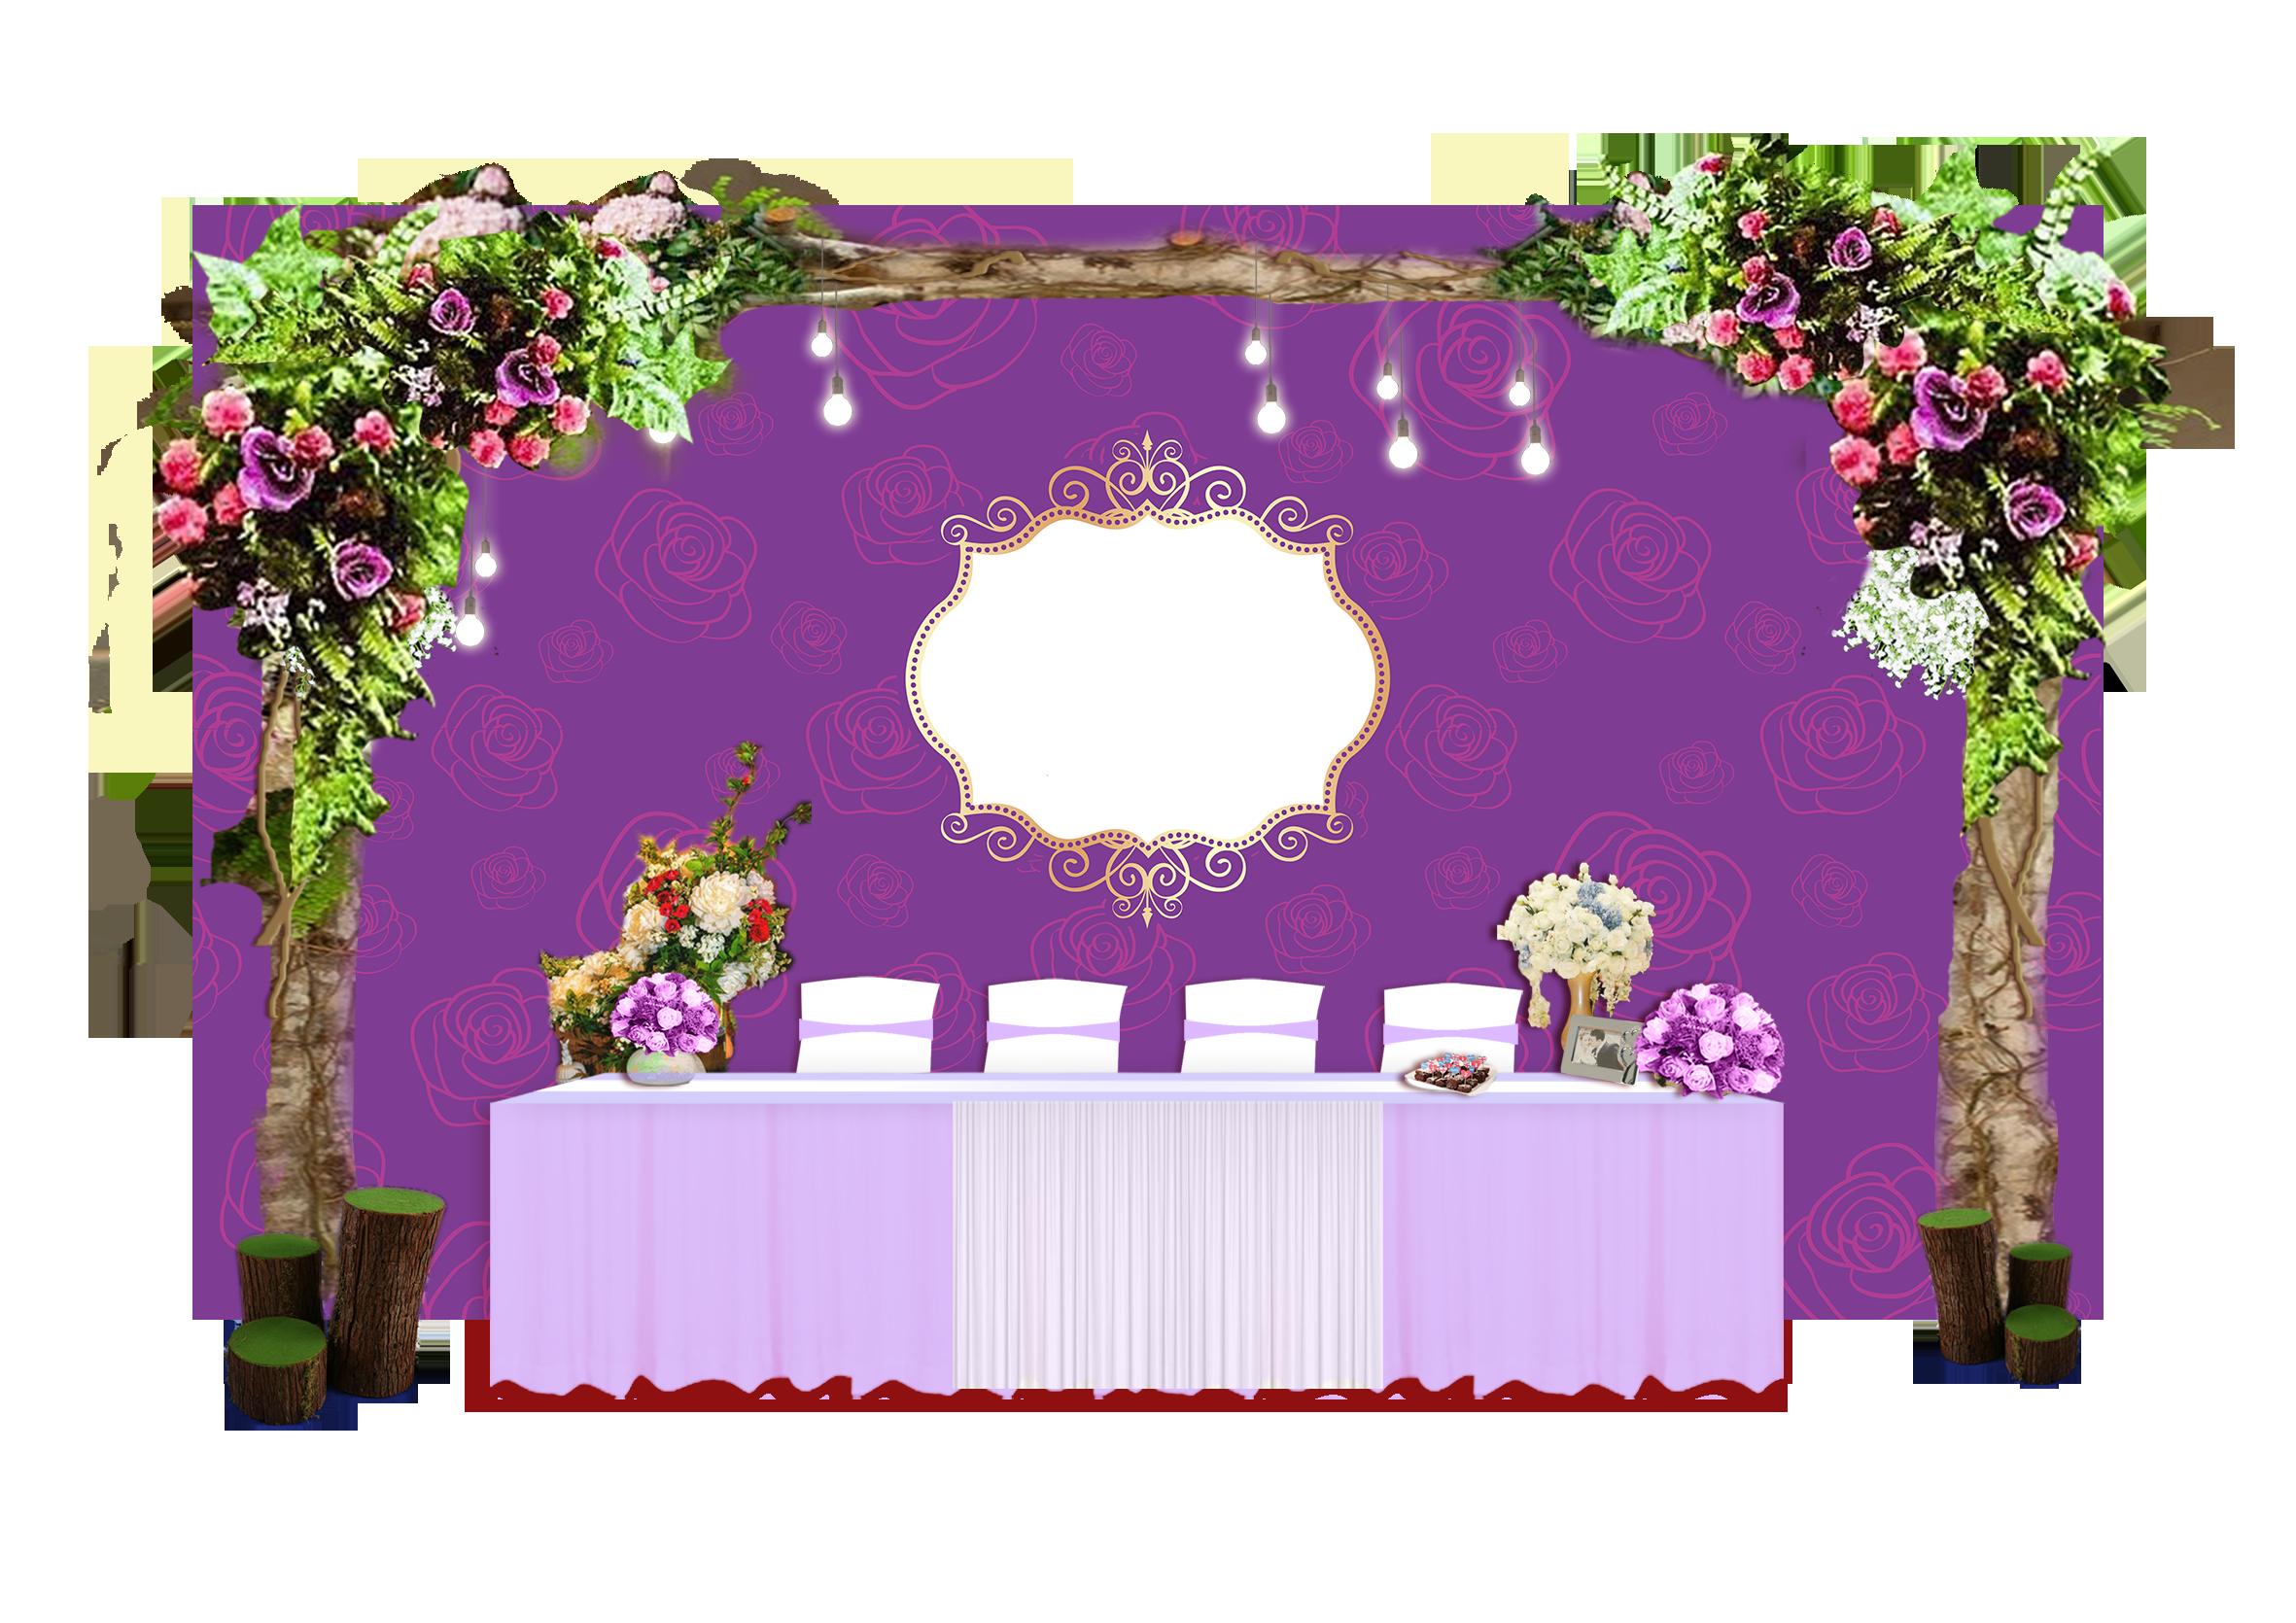 Clipart wedding archway. Chapel reception clip art